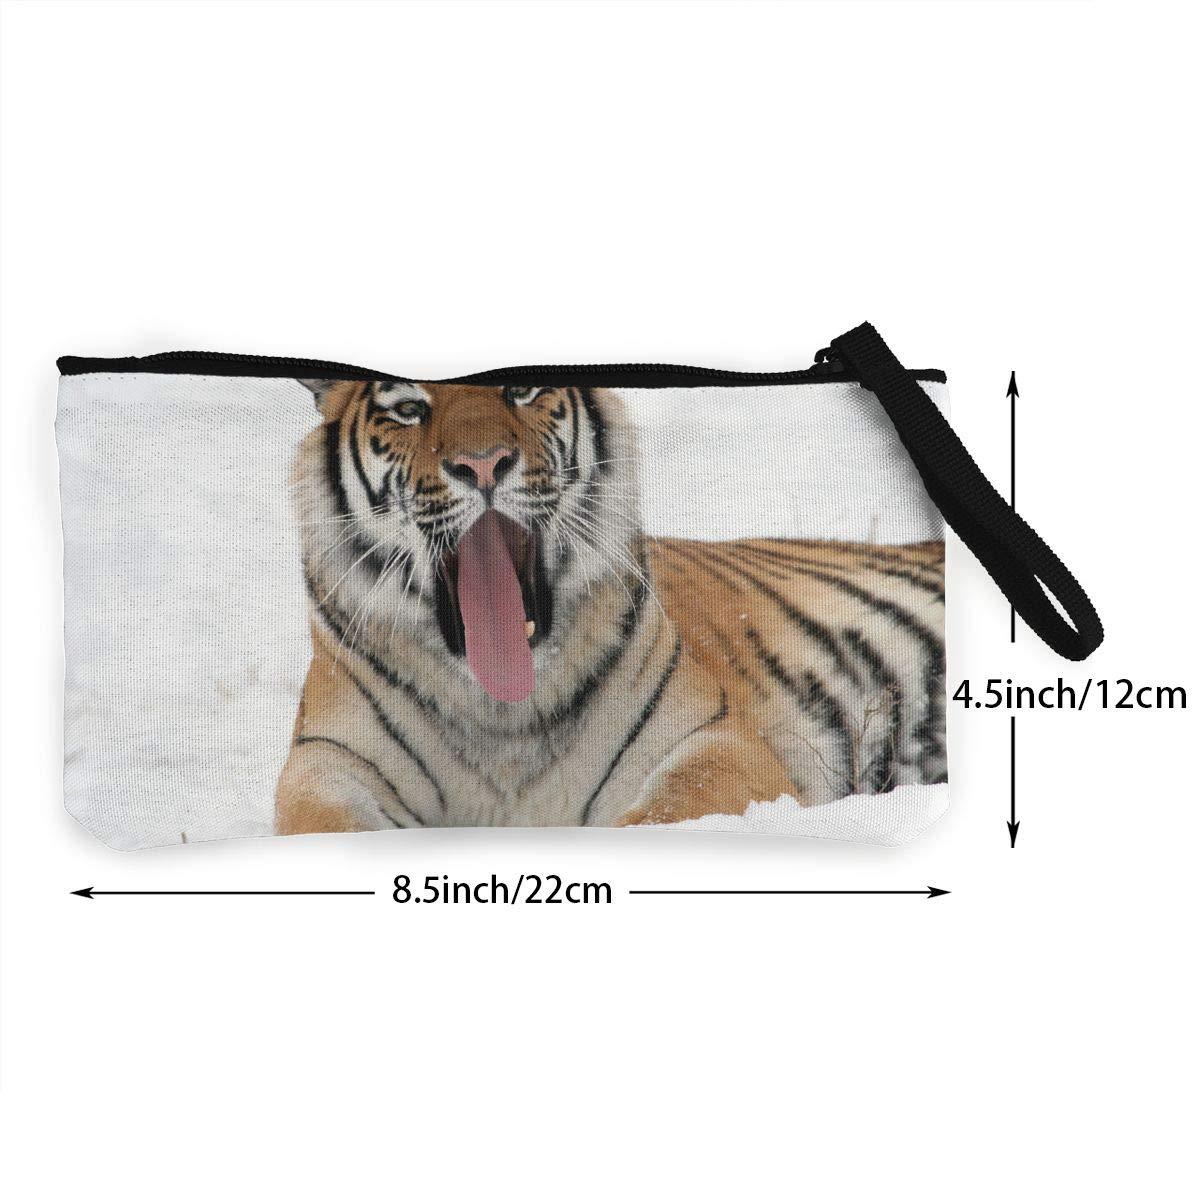 Fjhufe Tiger-yawning-snow-adult-reclining-zoo-wintercoin Bag Cute,useful,unisex,stylish,good Quality